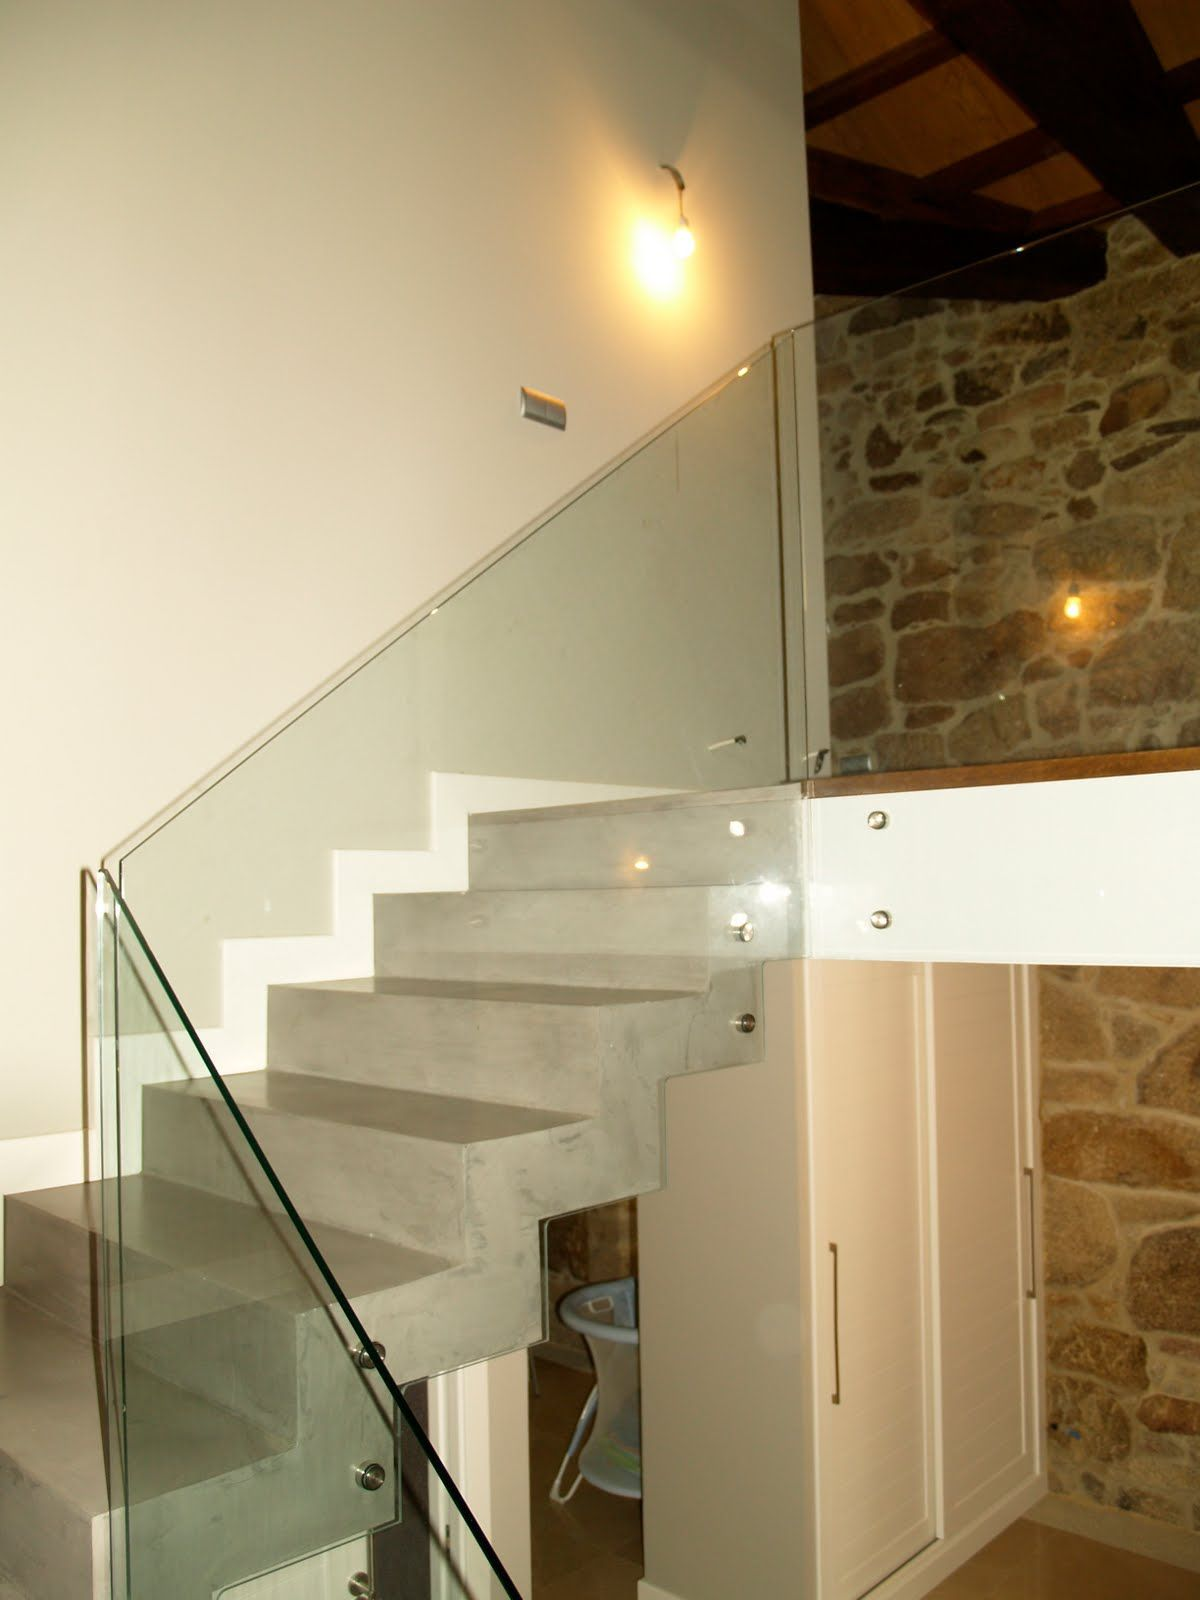 Barandilla vidrio templado para casa pinterest vidrio templado vidrio y escalera - Barandilla cristal escalera ...